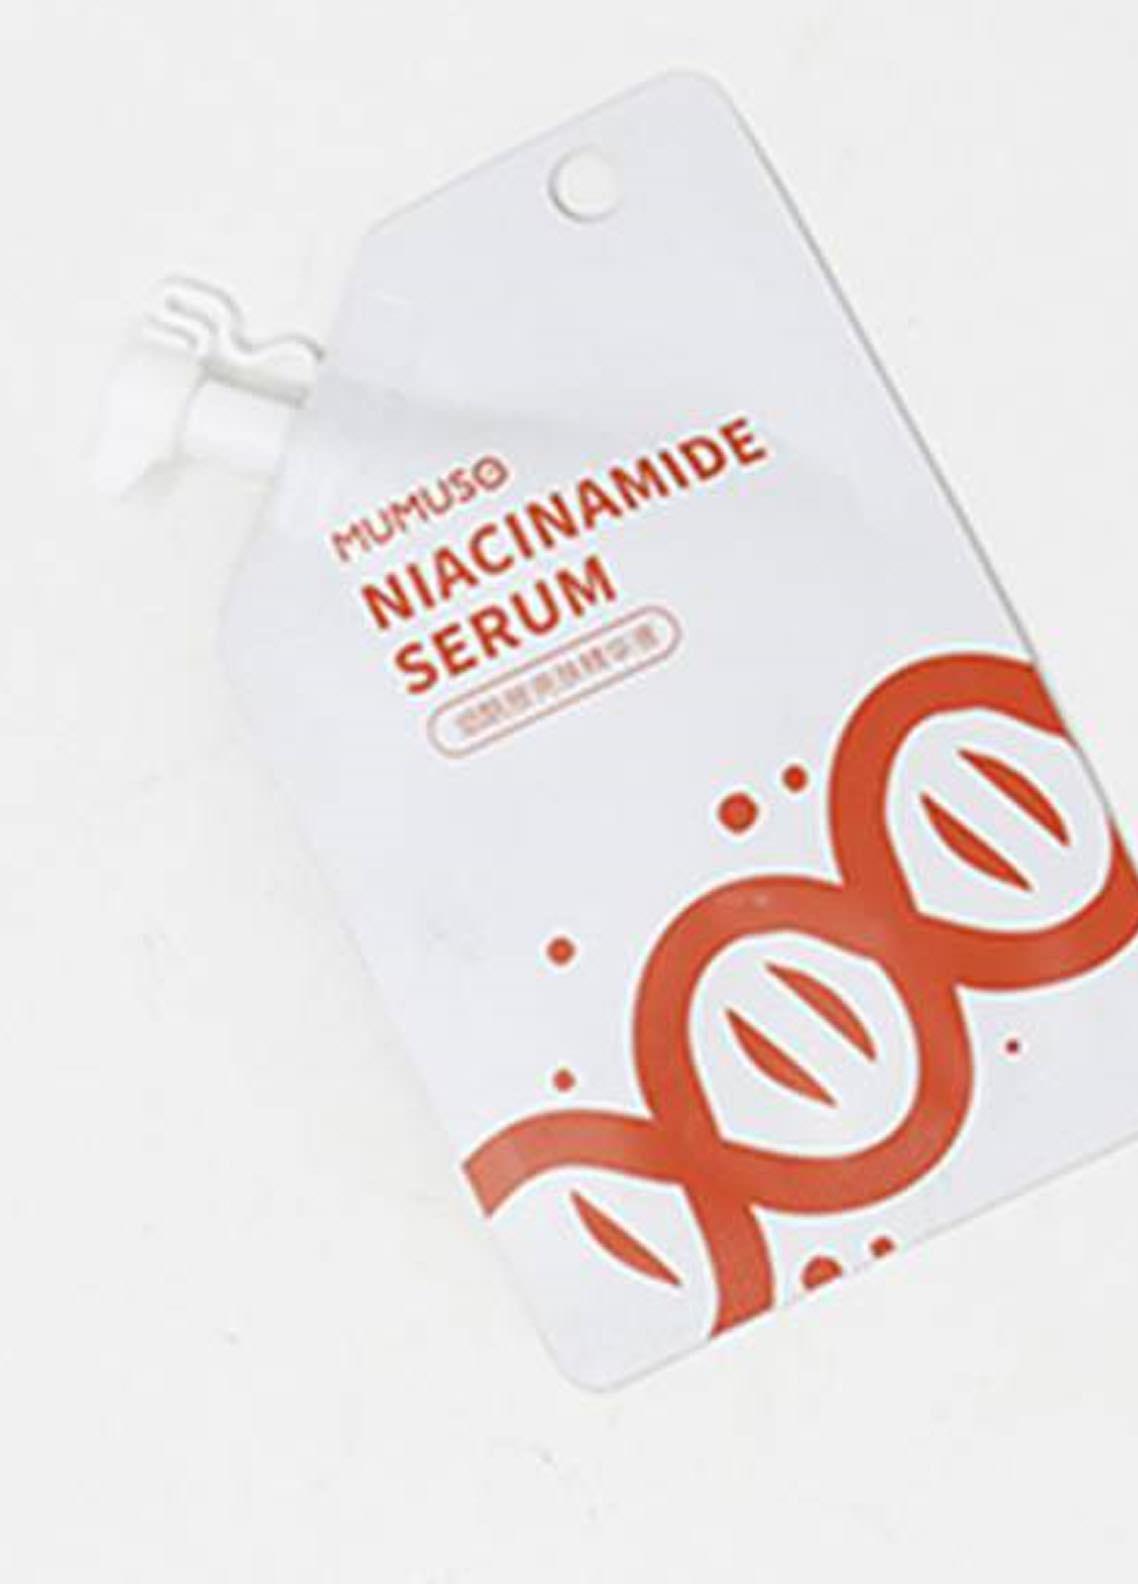 Mumuso Niacinamide Brightening Serum